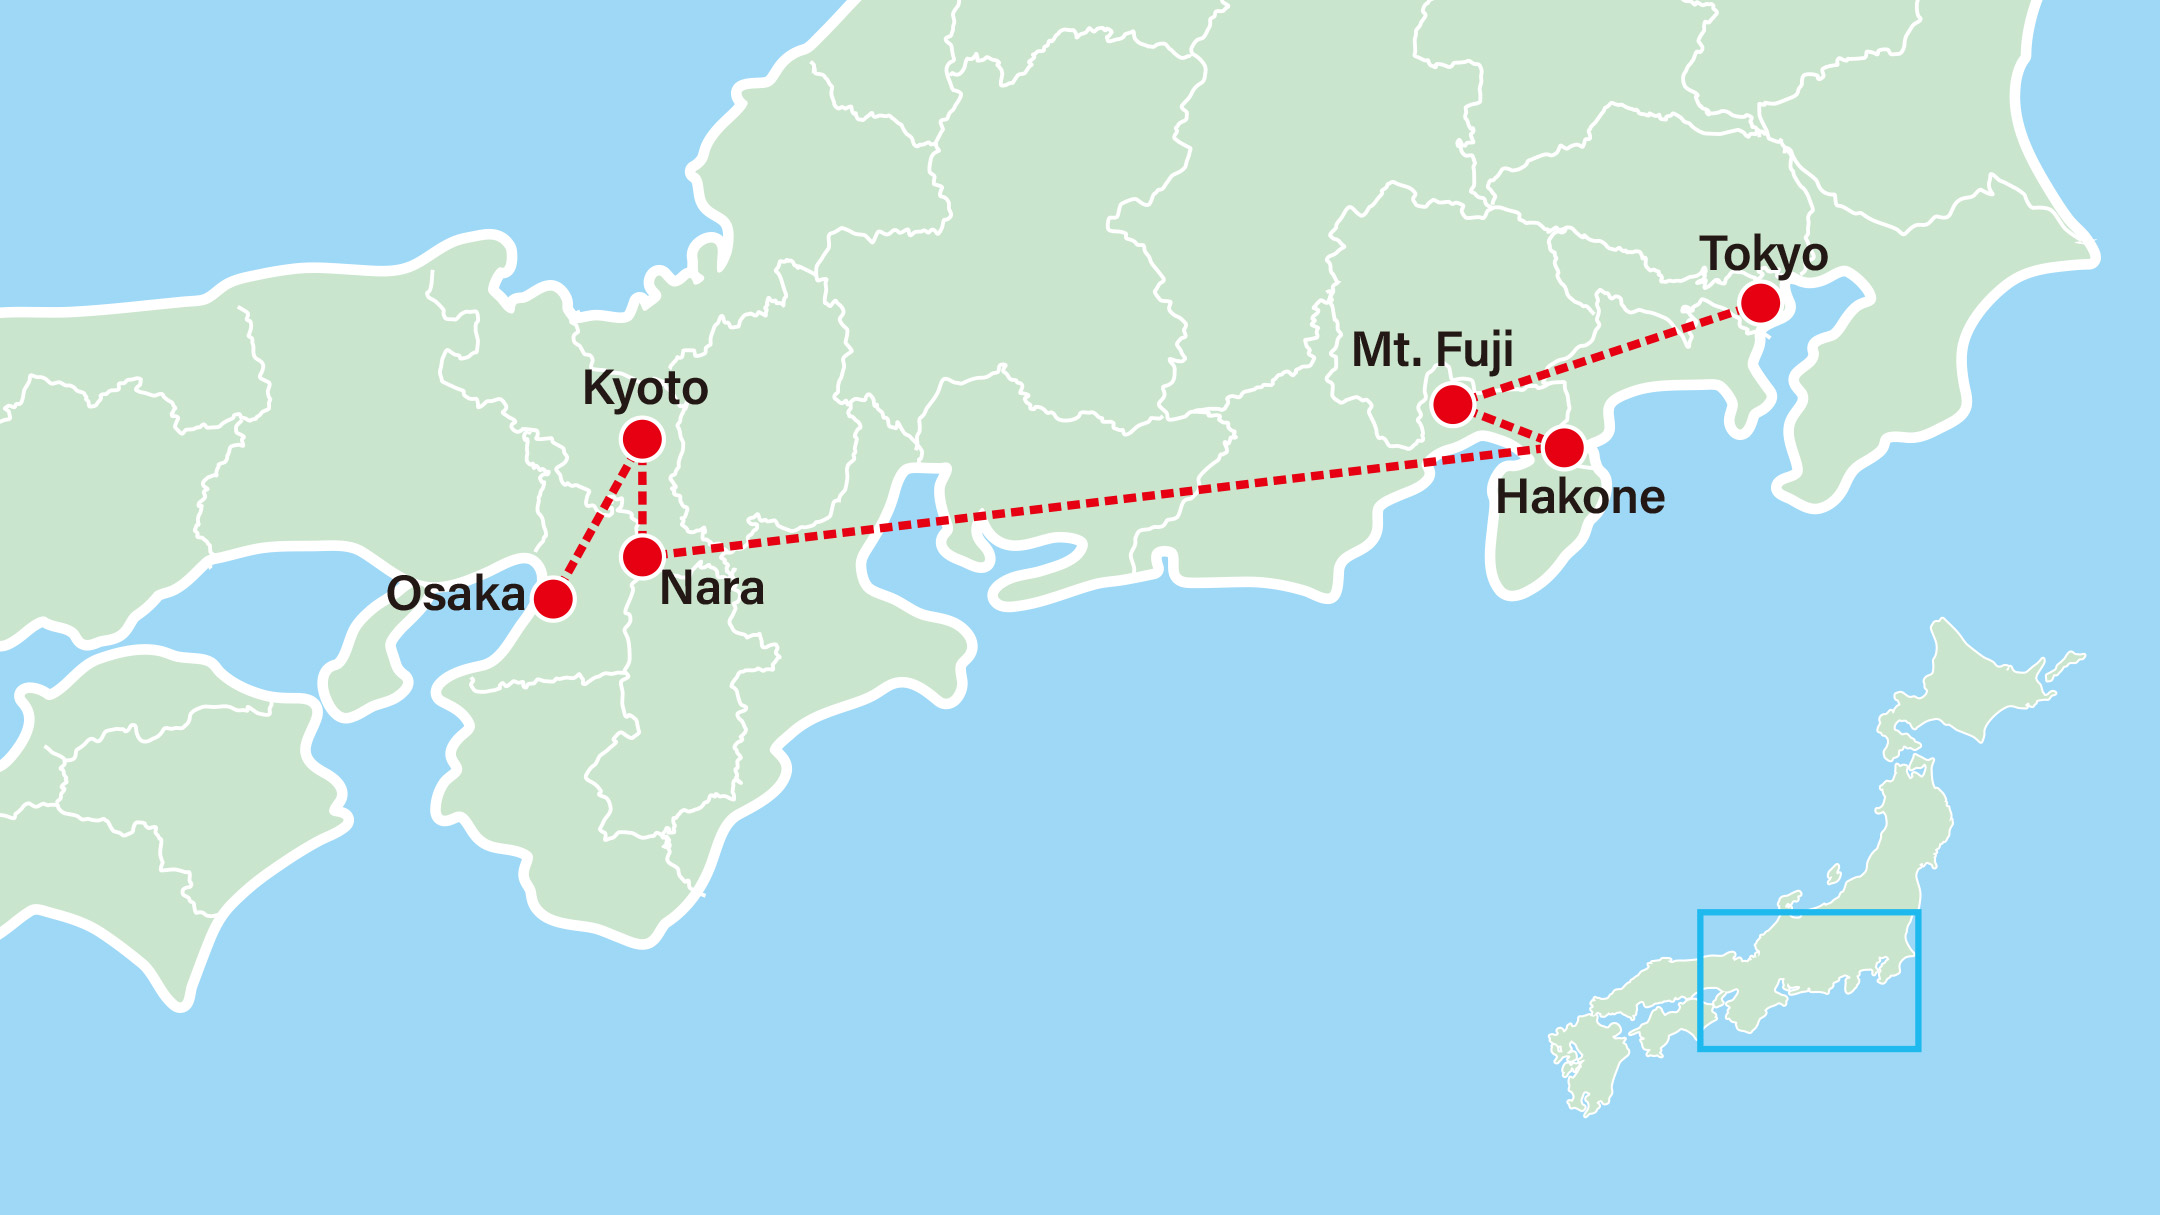 Golden Route of Japan 9 Days Anime-Kyoto-Nara-Mt Fuji-Hakone-Tokyo-Akihabara